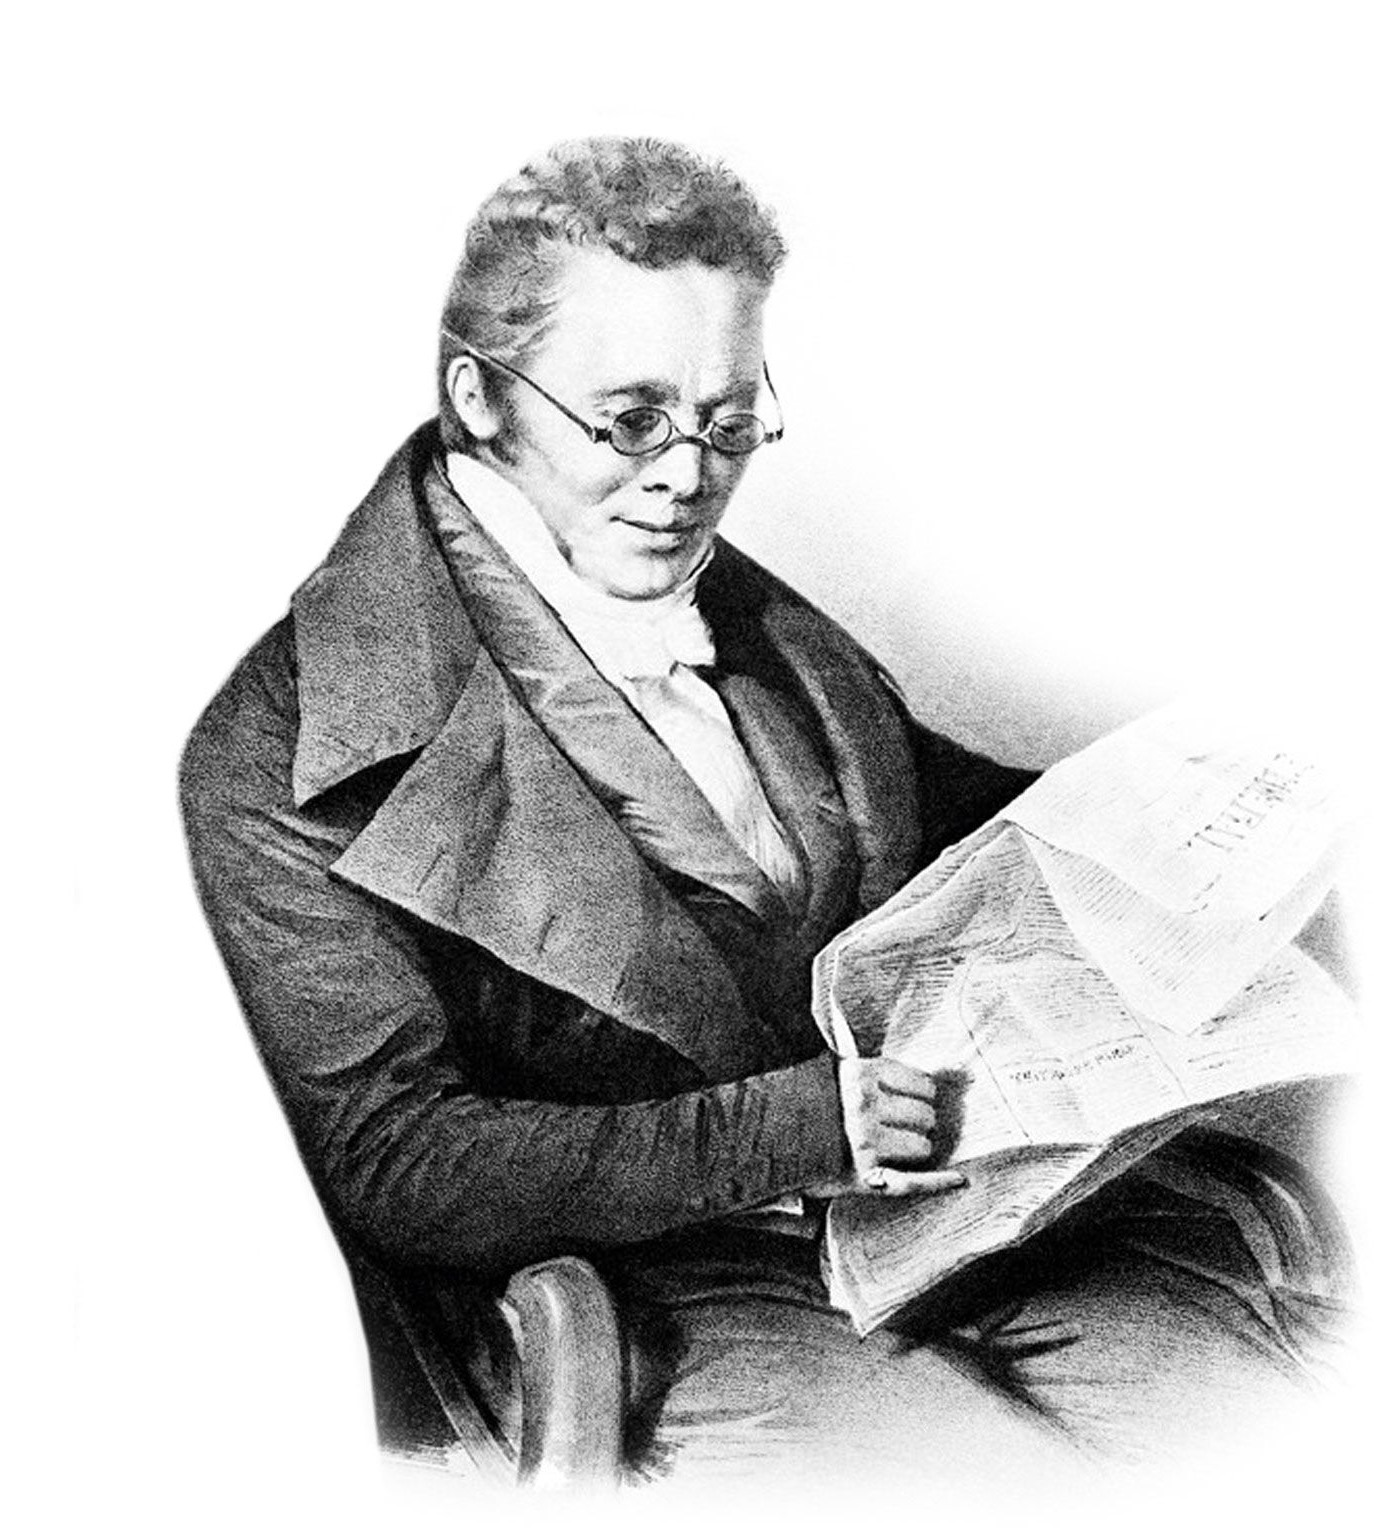 Jean-Frnçois Bautte